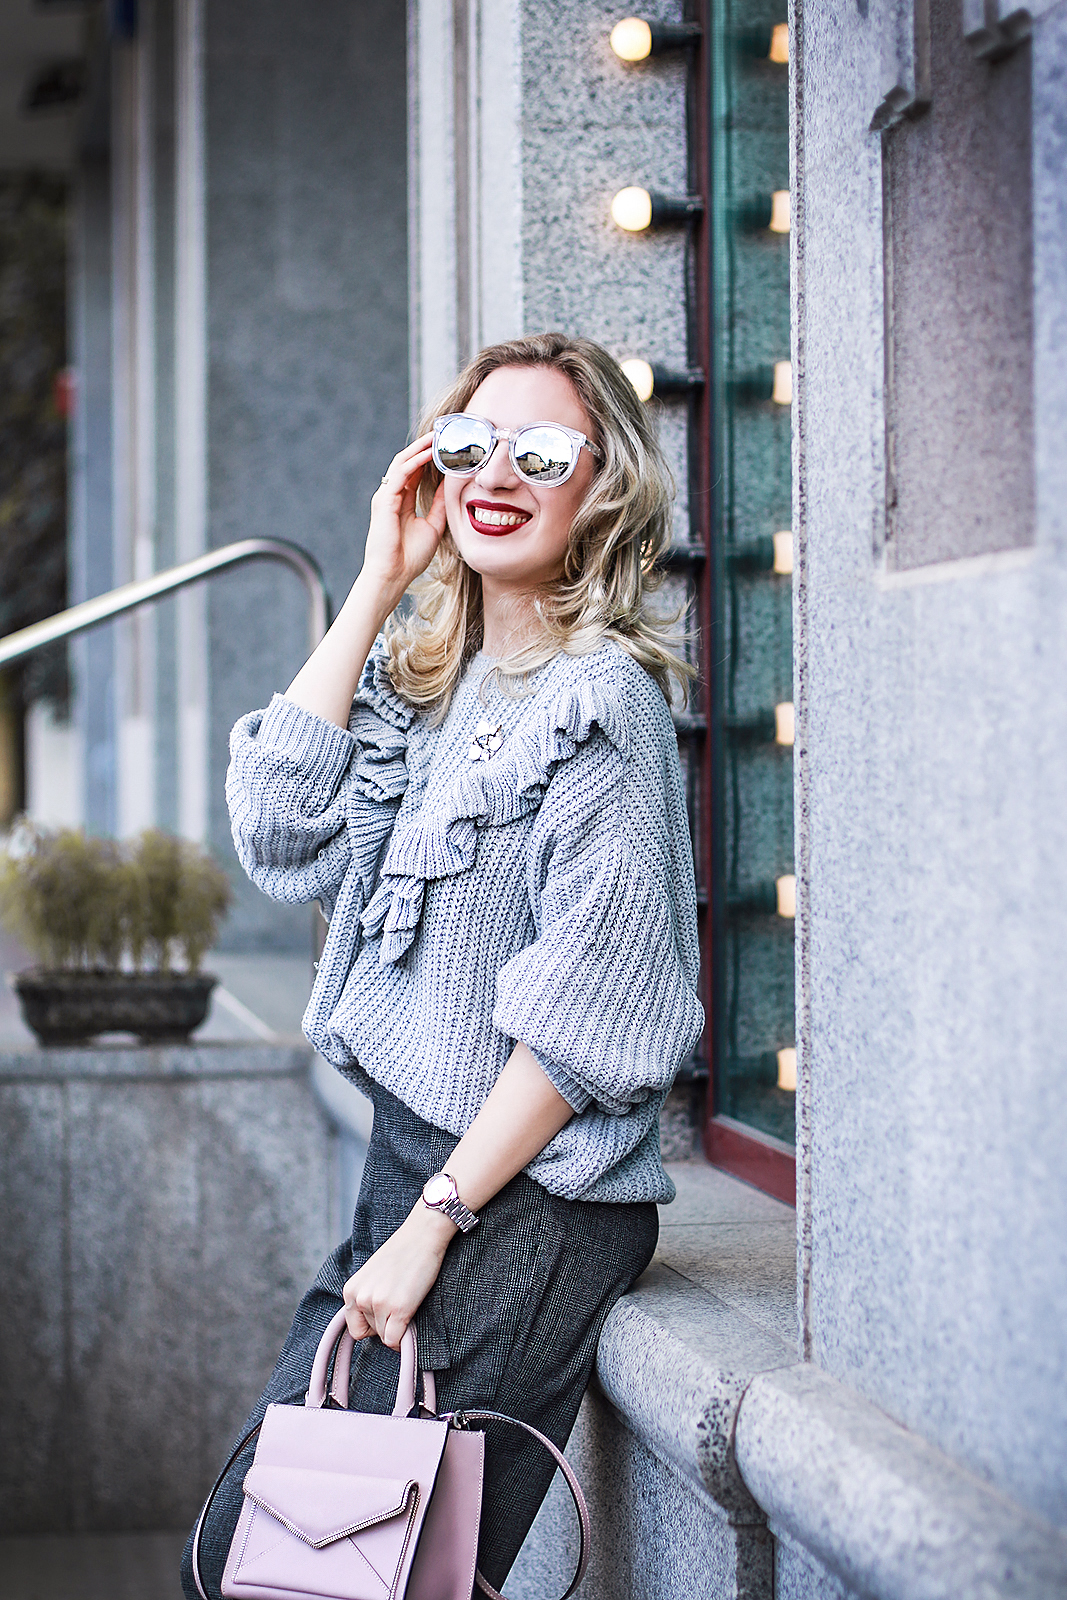 margarita_maslova_ritalifestyle_silver_shoes_cozy_ruffles_sweater_grey_pants_streetstyle_moscow_russian_fashion_blogger6